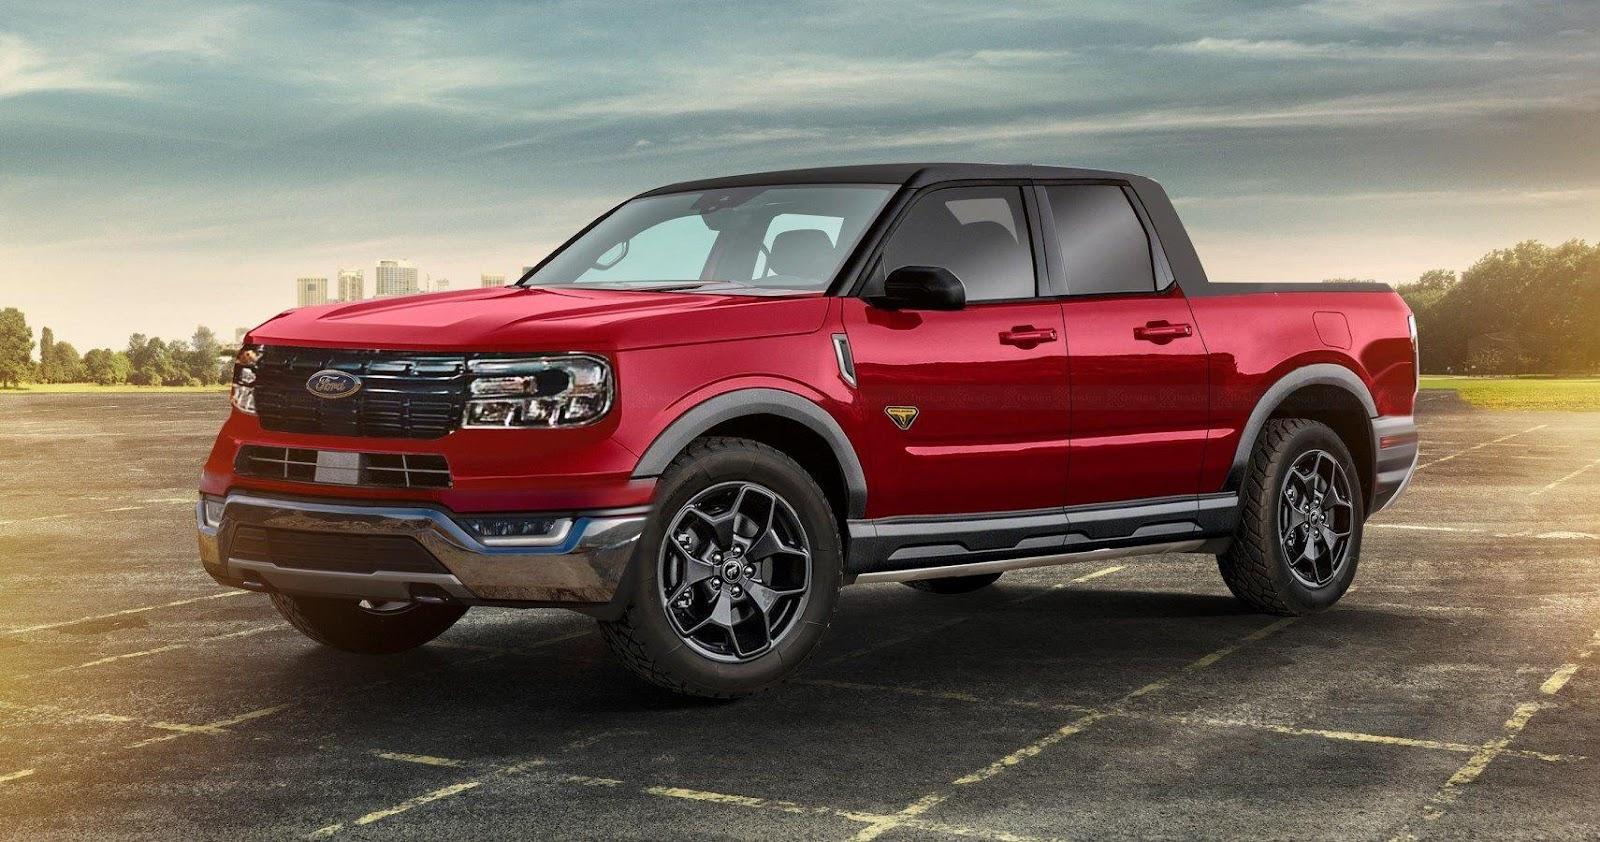 2022 Ford Maverick Rendering Imagines A Stunning Design ...